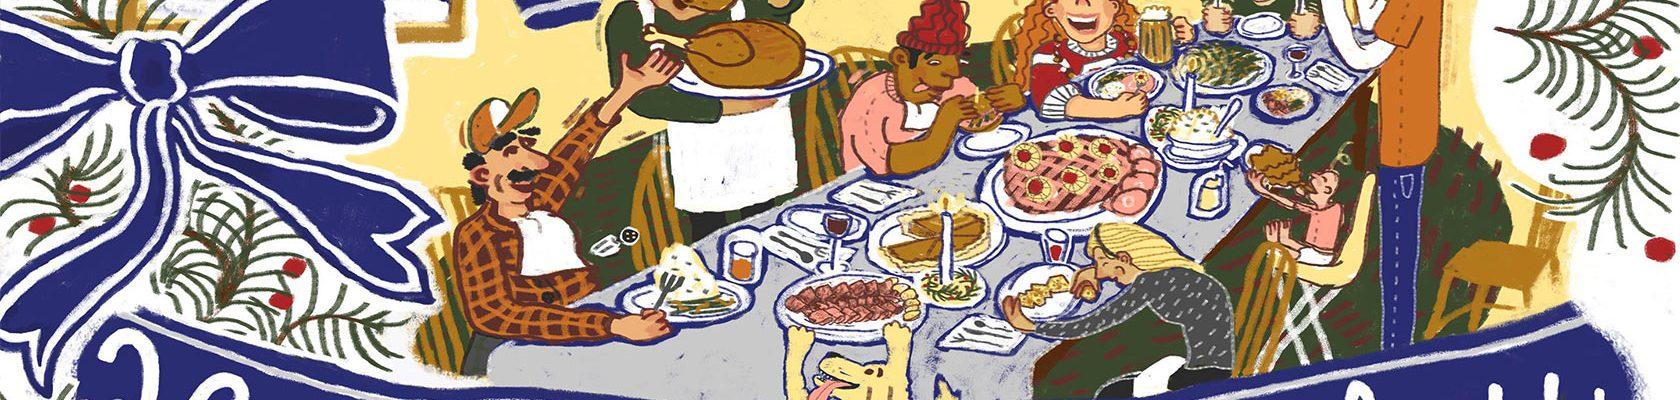 Katzinger's Homemade Holiday